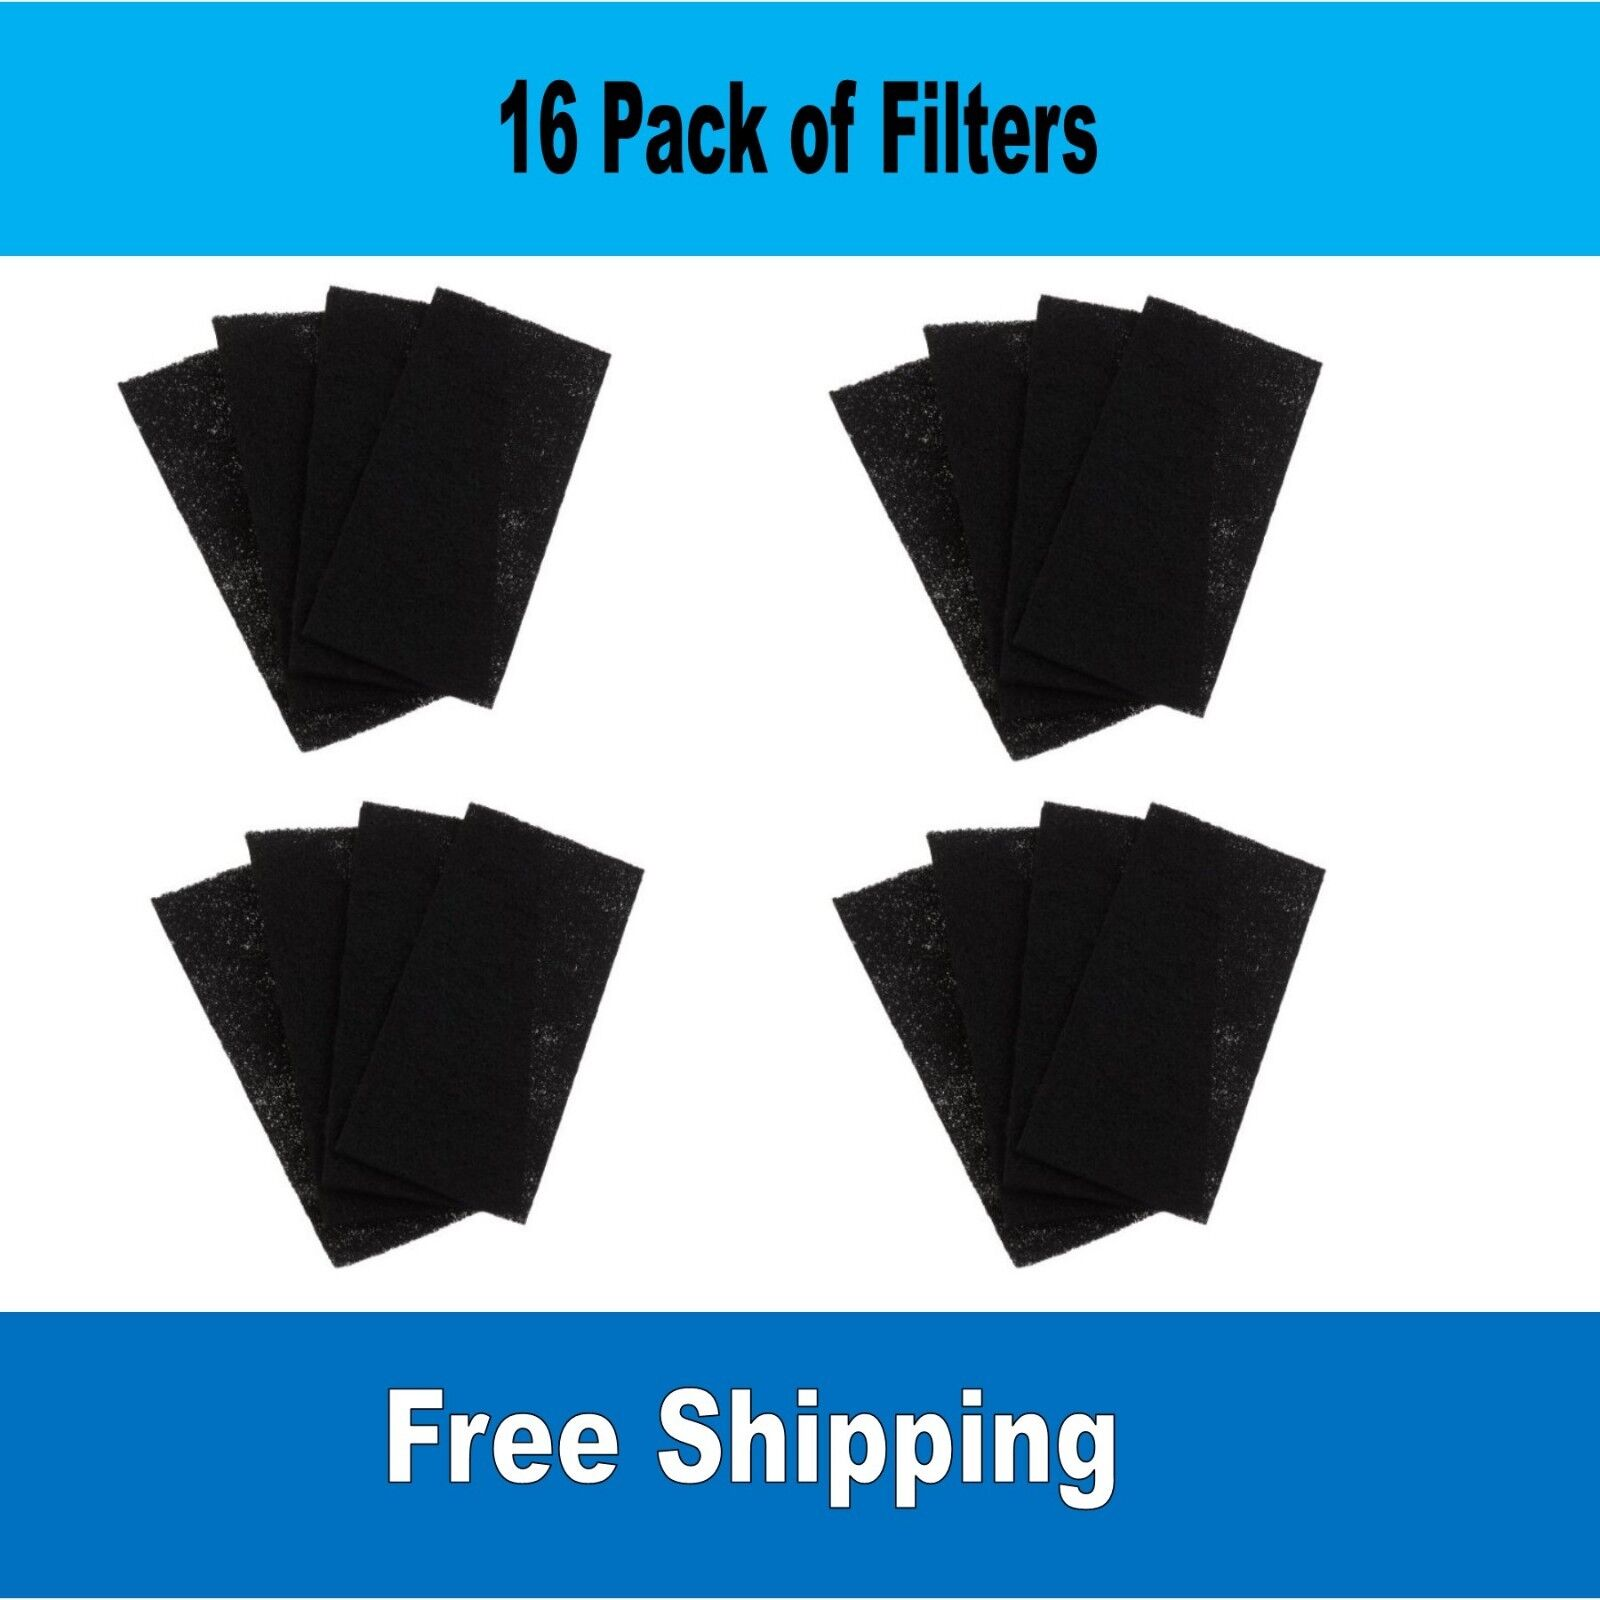 16-Pack Holmes Bionaire GE Compatible Carbon Filter HAPF60, HAPF60PDQ-U, A1260C